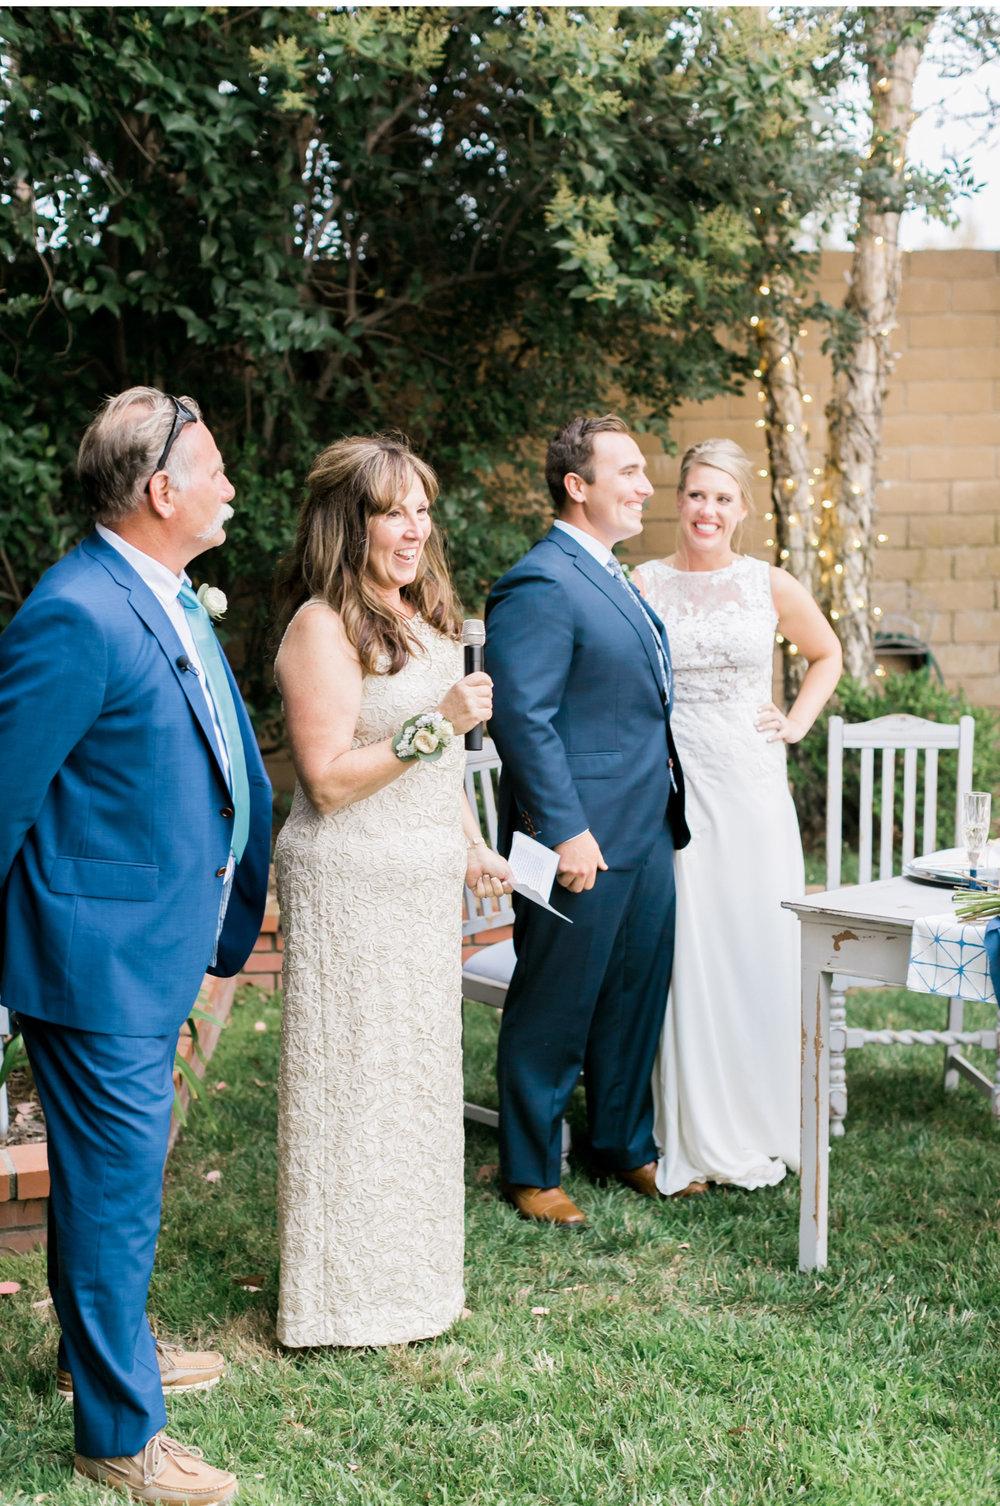 Southern-California-Wedding-Photographer-Natalie-Schutt-Photography_13.jpg